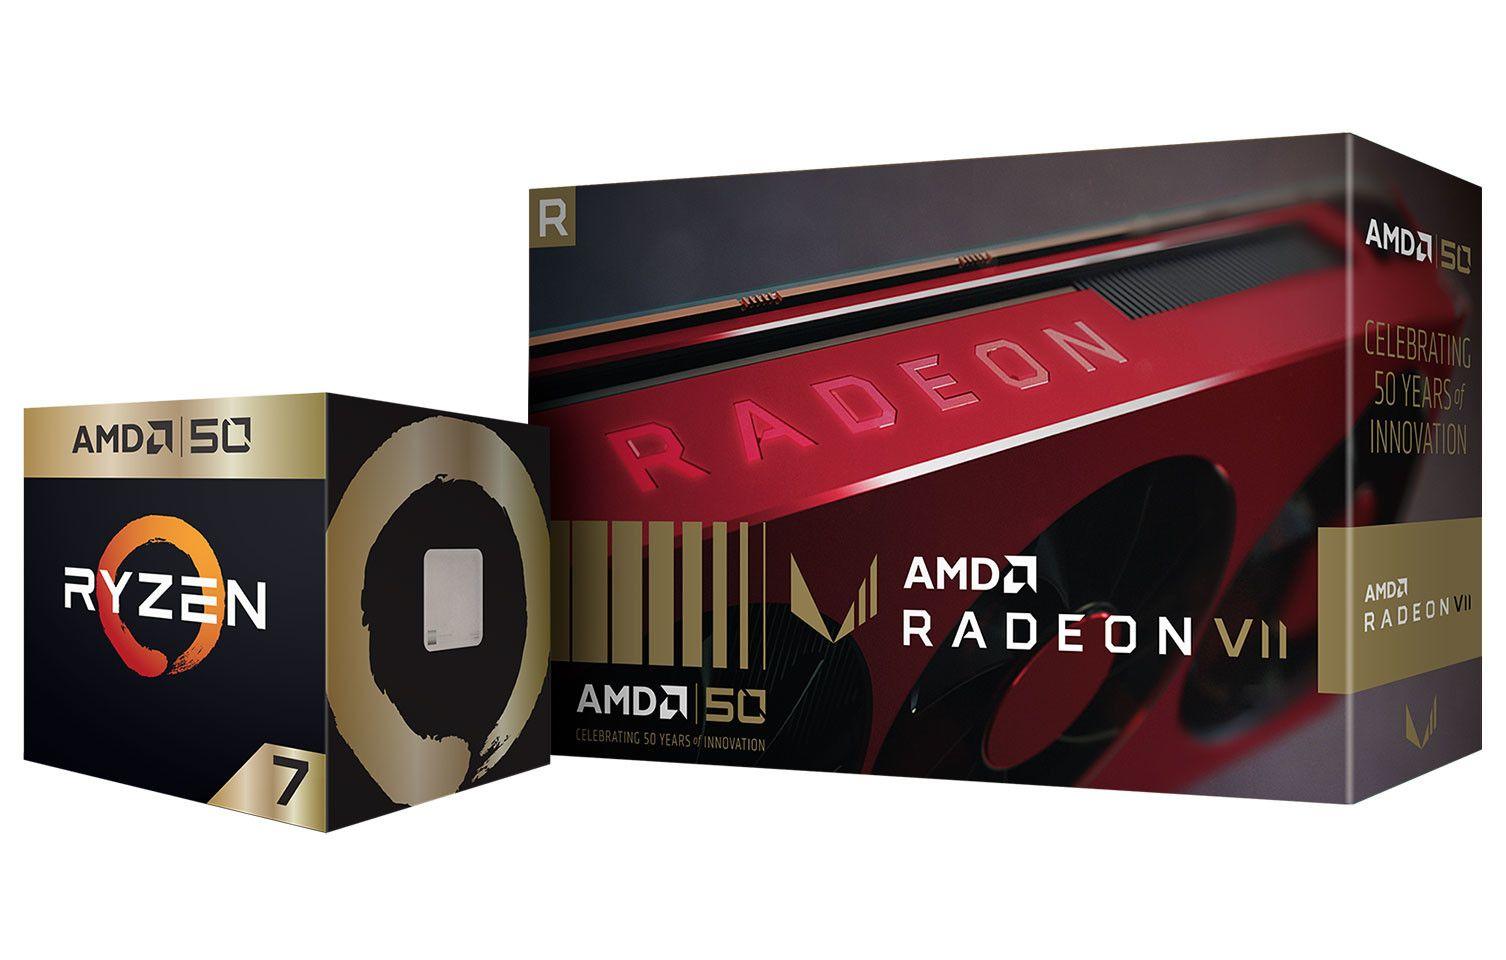 Amd Announces 50th Anniversary Commemorative Ryzen And Radeon Products 50th Anniversary Graphic Card 50th Anniversary Celebration